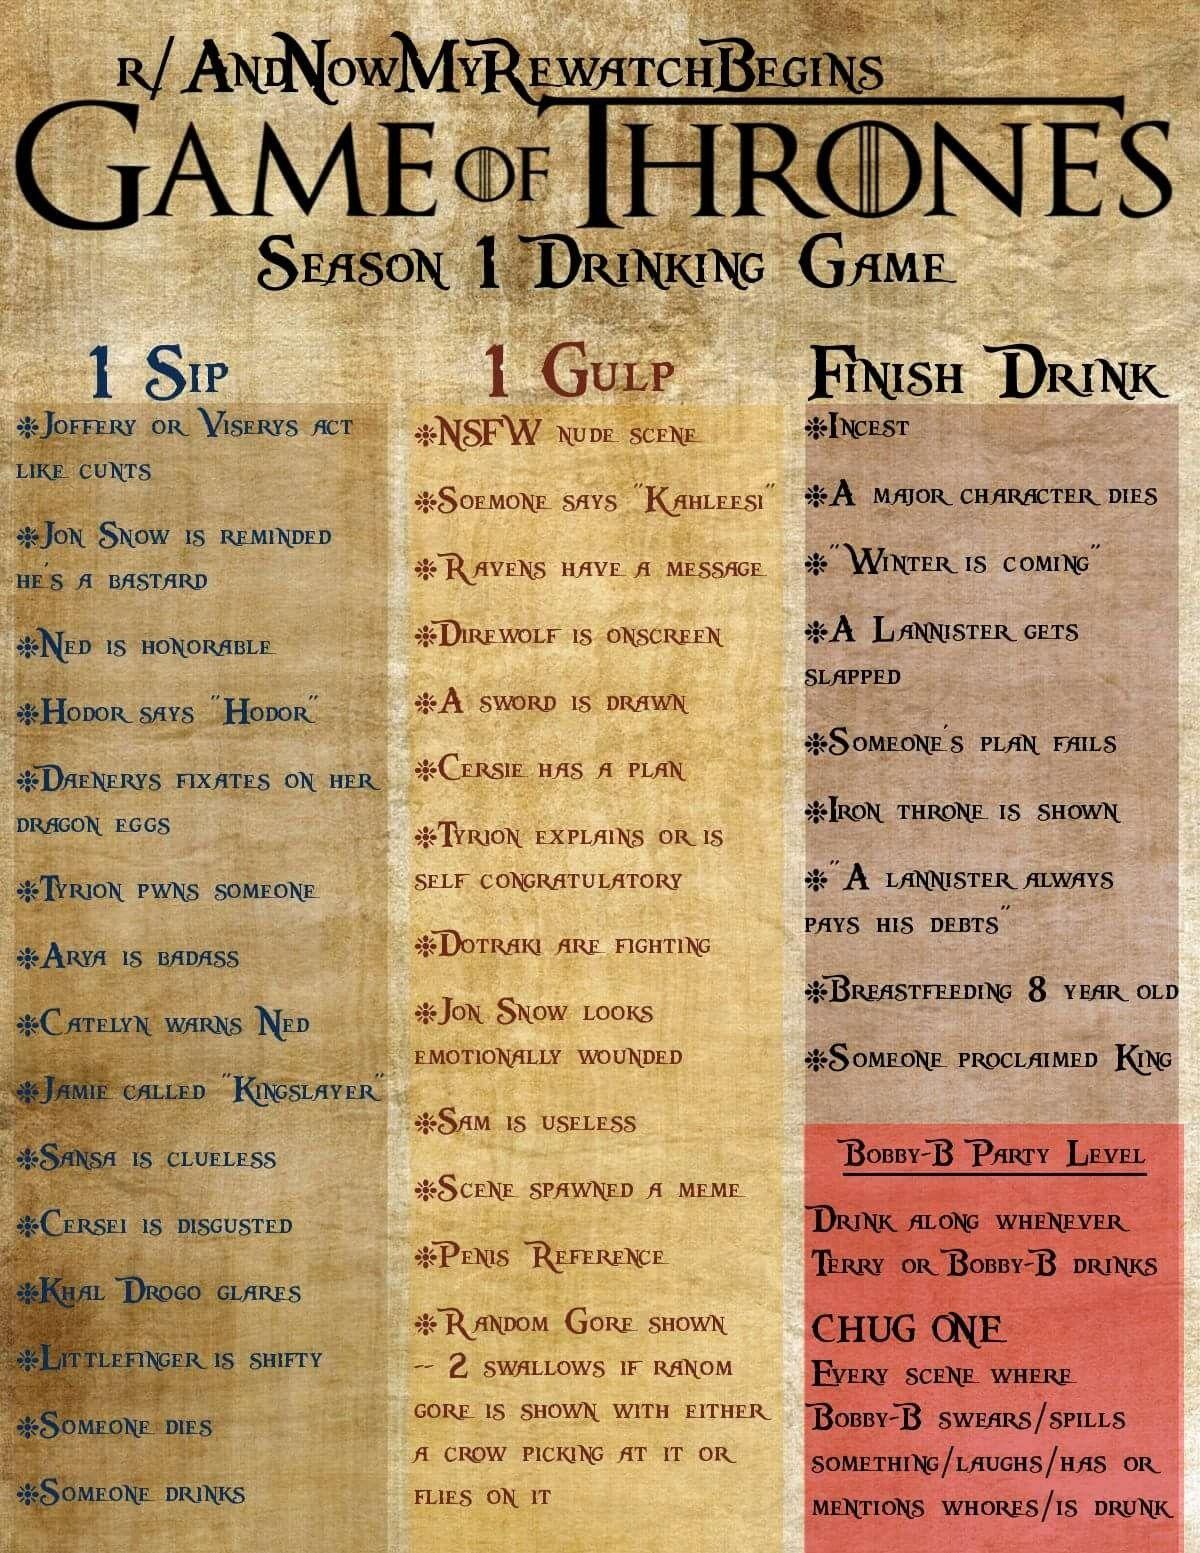 Game Of Thrones Season 1 Drinking Game Drinking Games Game Of Thrones Party Game Of Thrones Drink